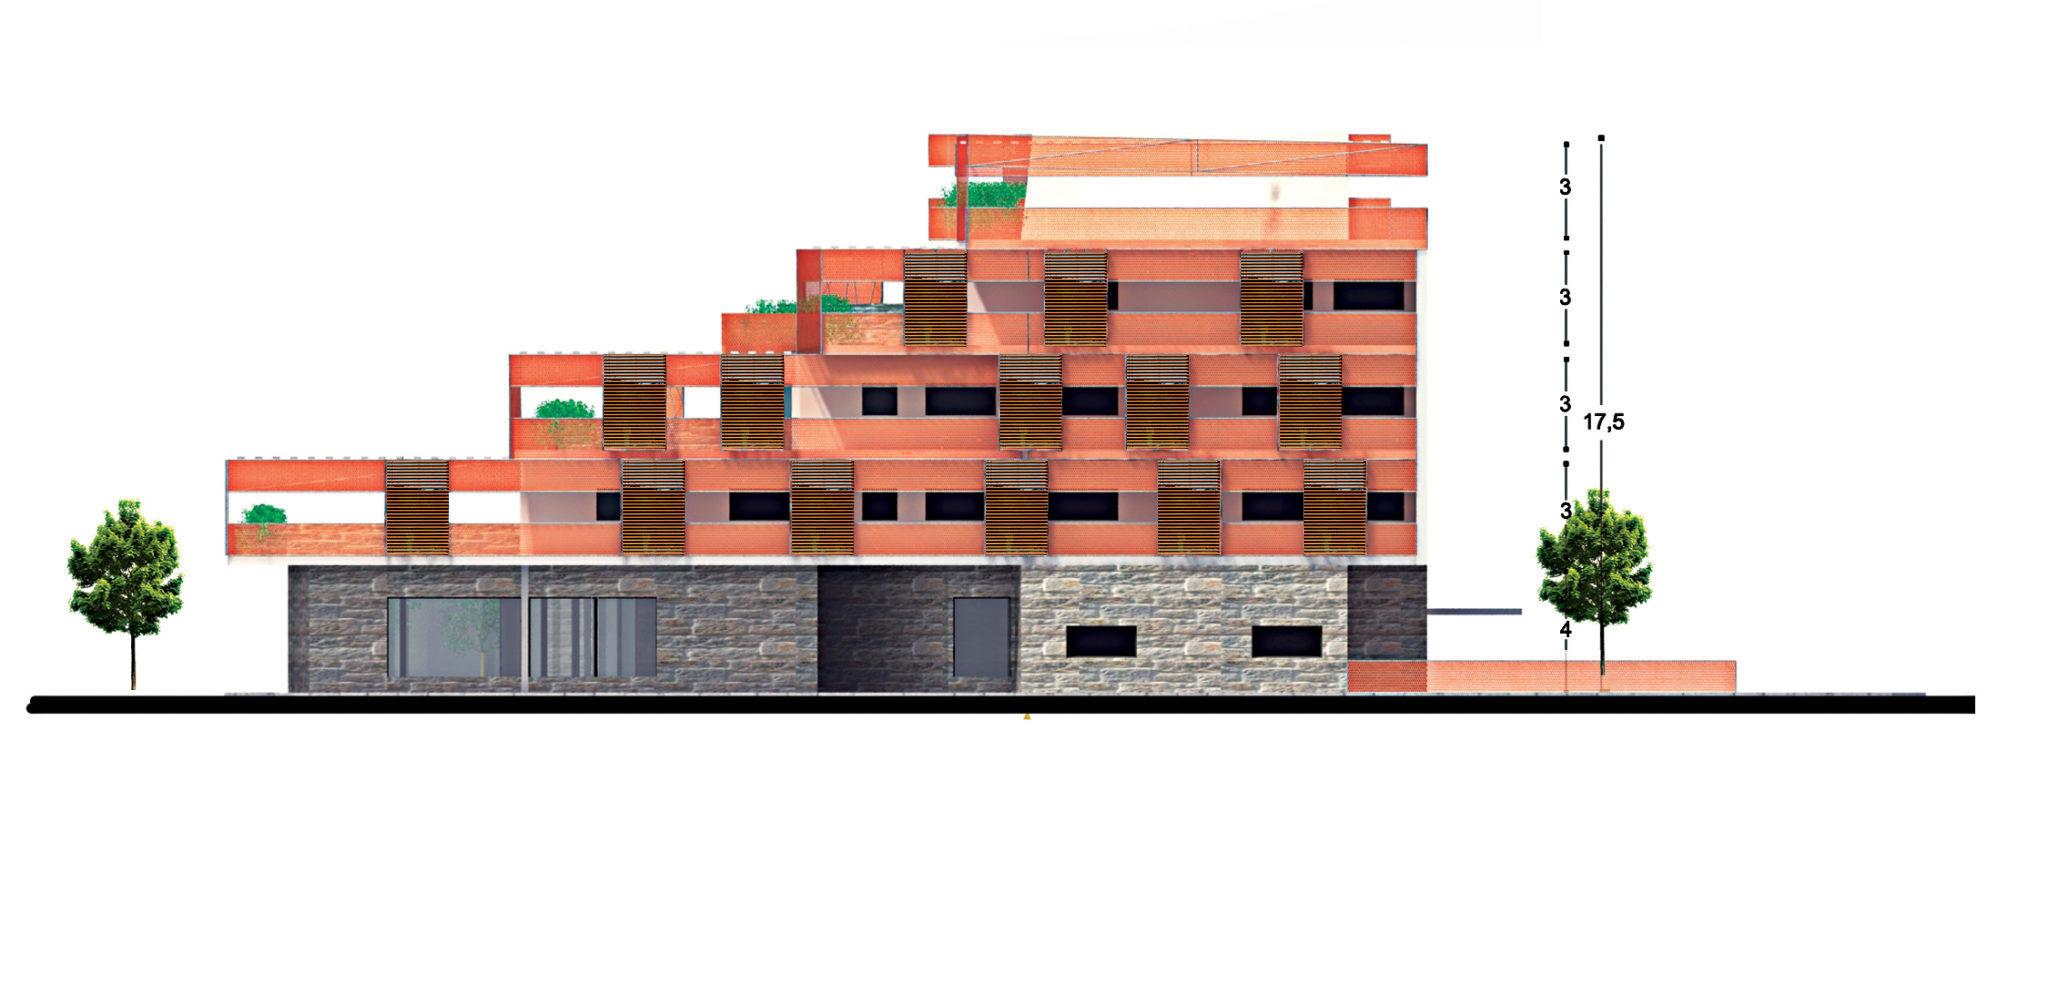 MAT. Matera. Residential